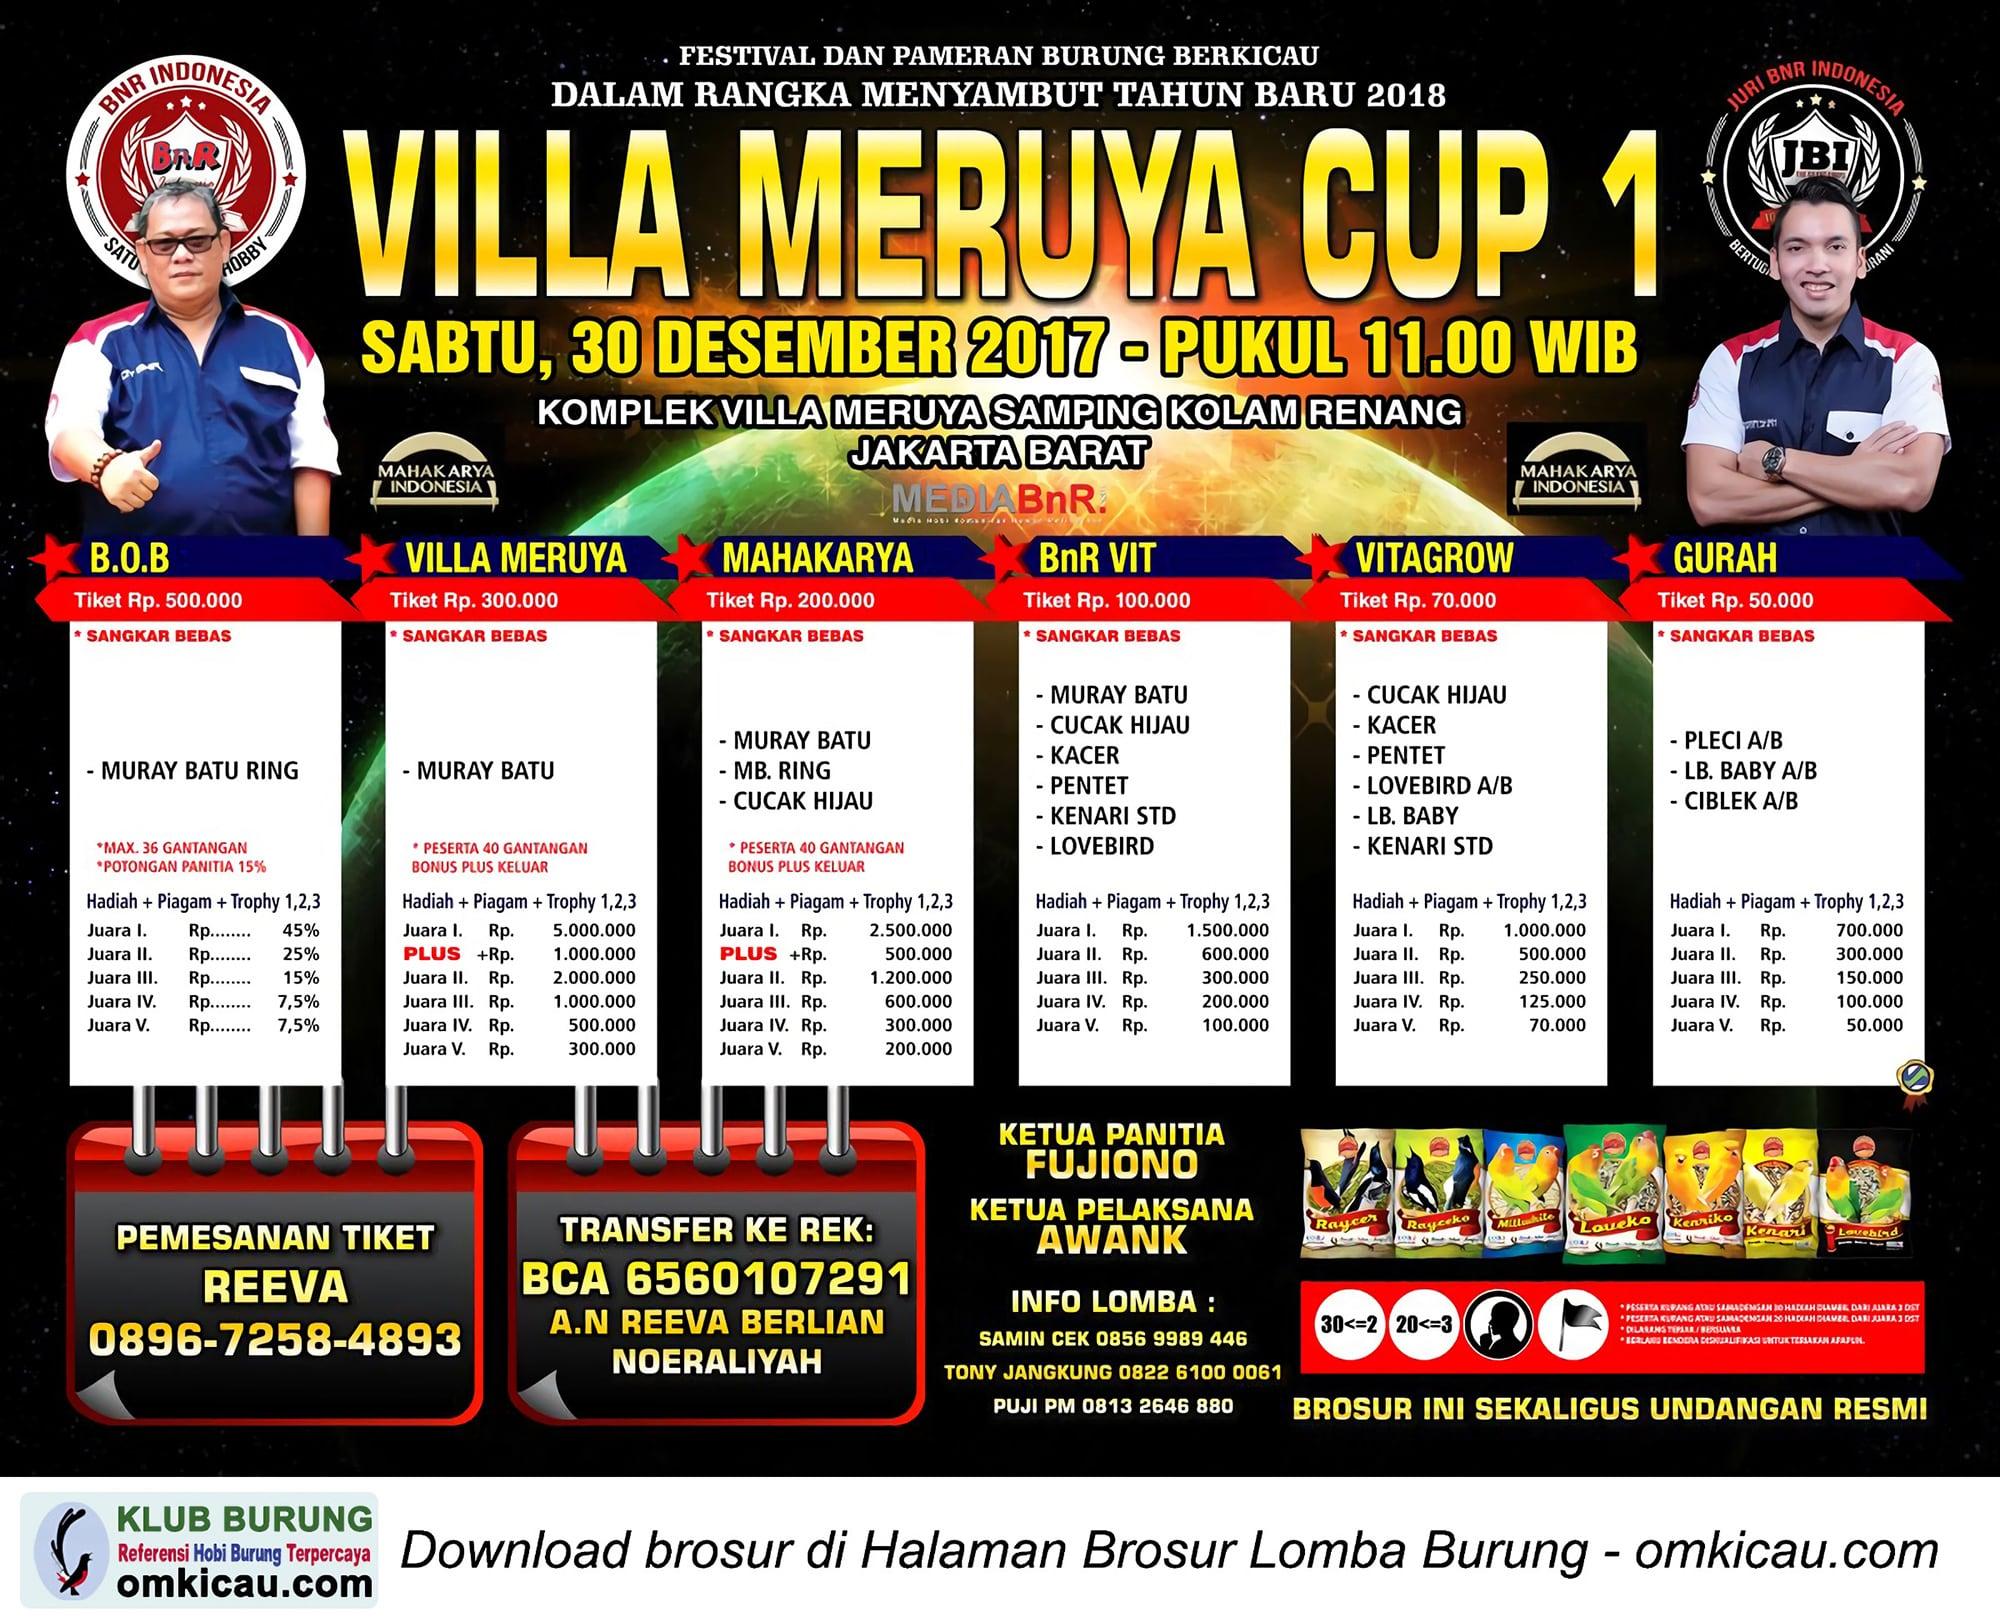 Villa Meruya Cup 1